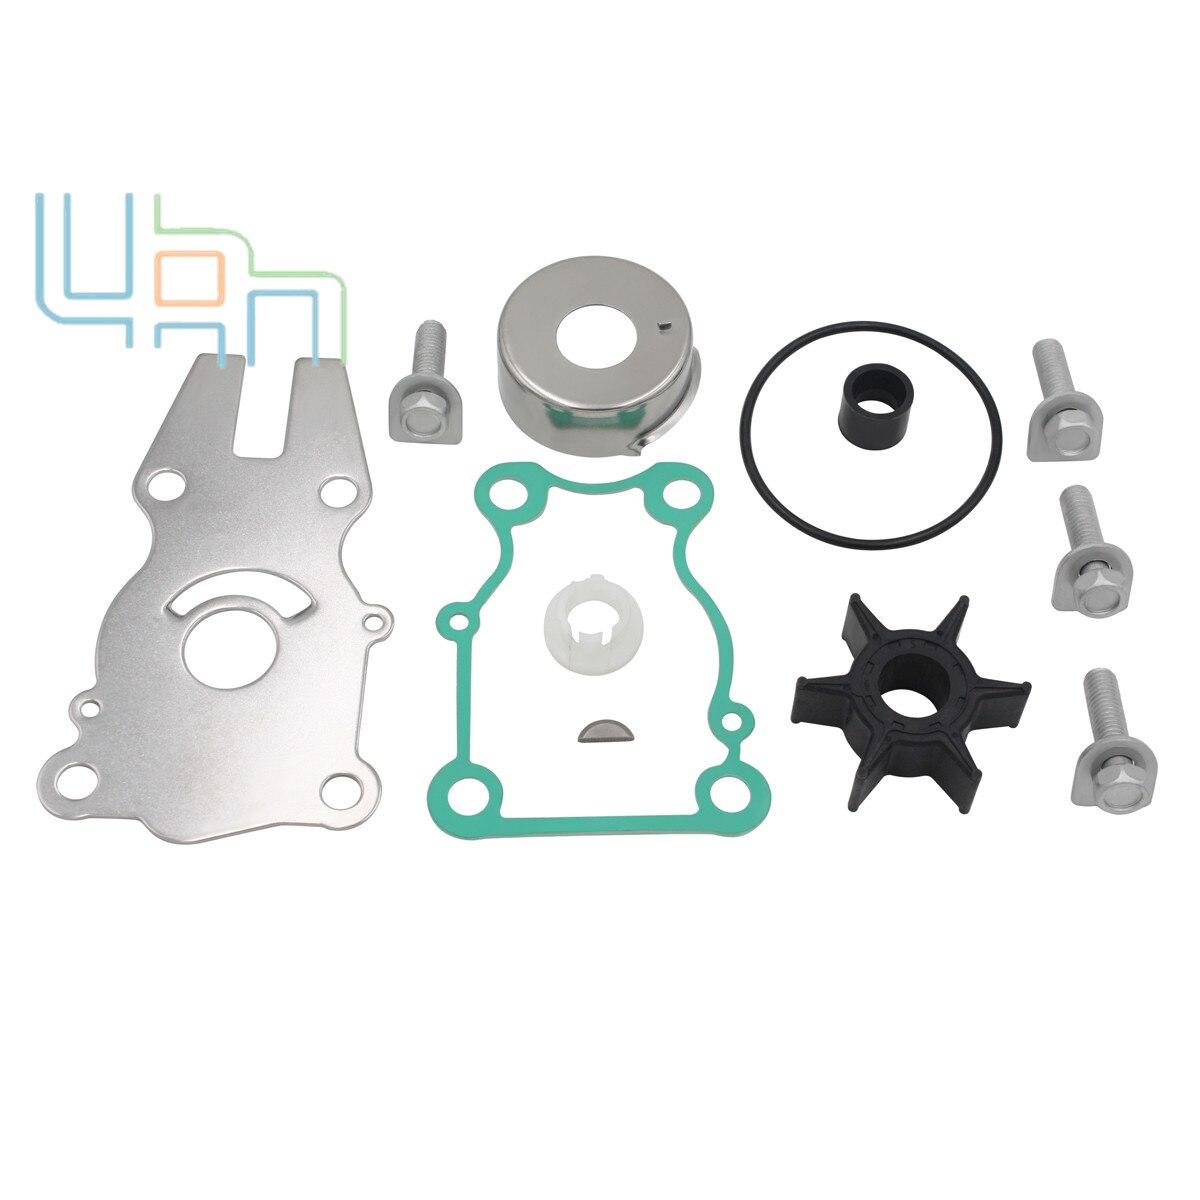 Impeller Wasserpumpenkit water pump kit für Yamaha 30 40 F30 F40 6BG-W0078-00-00